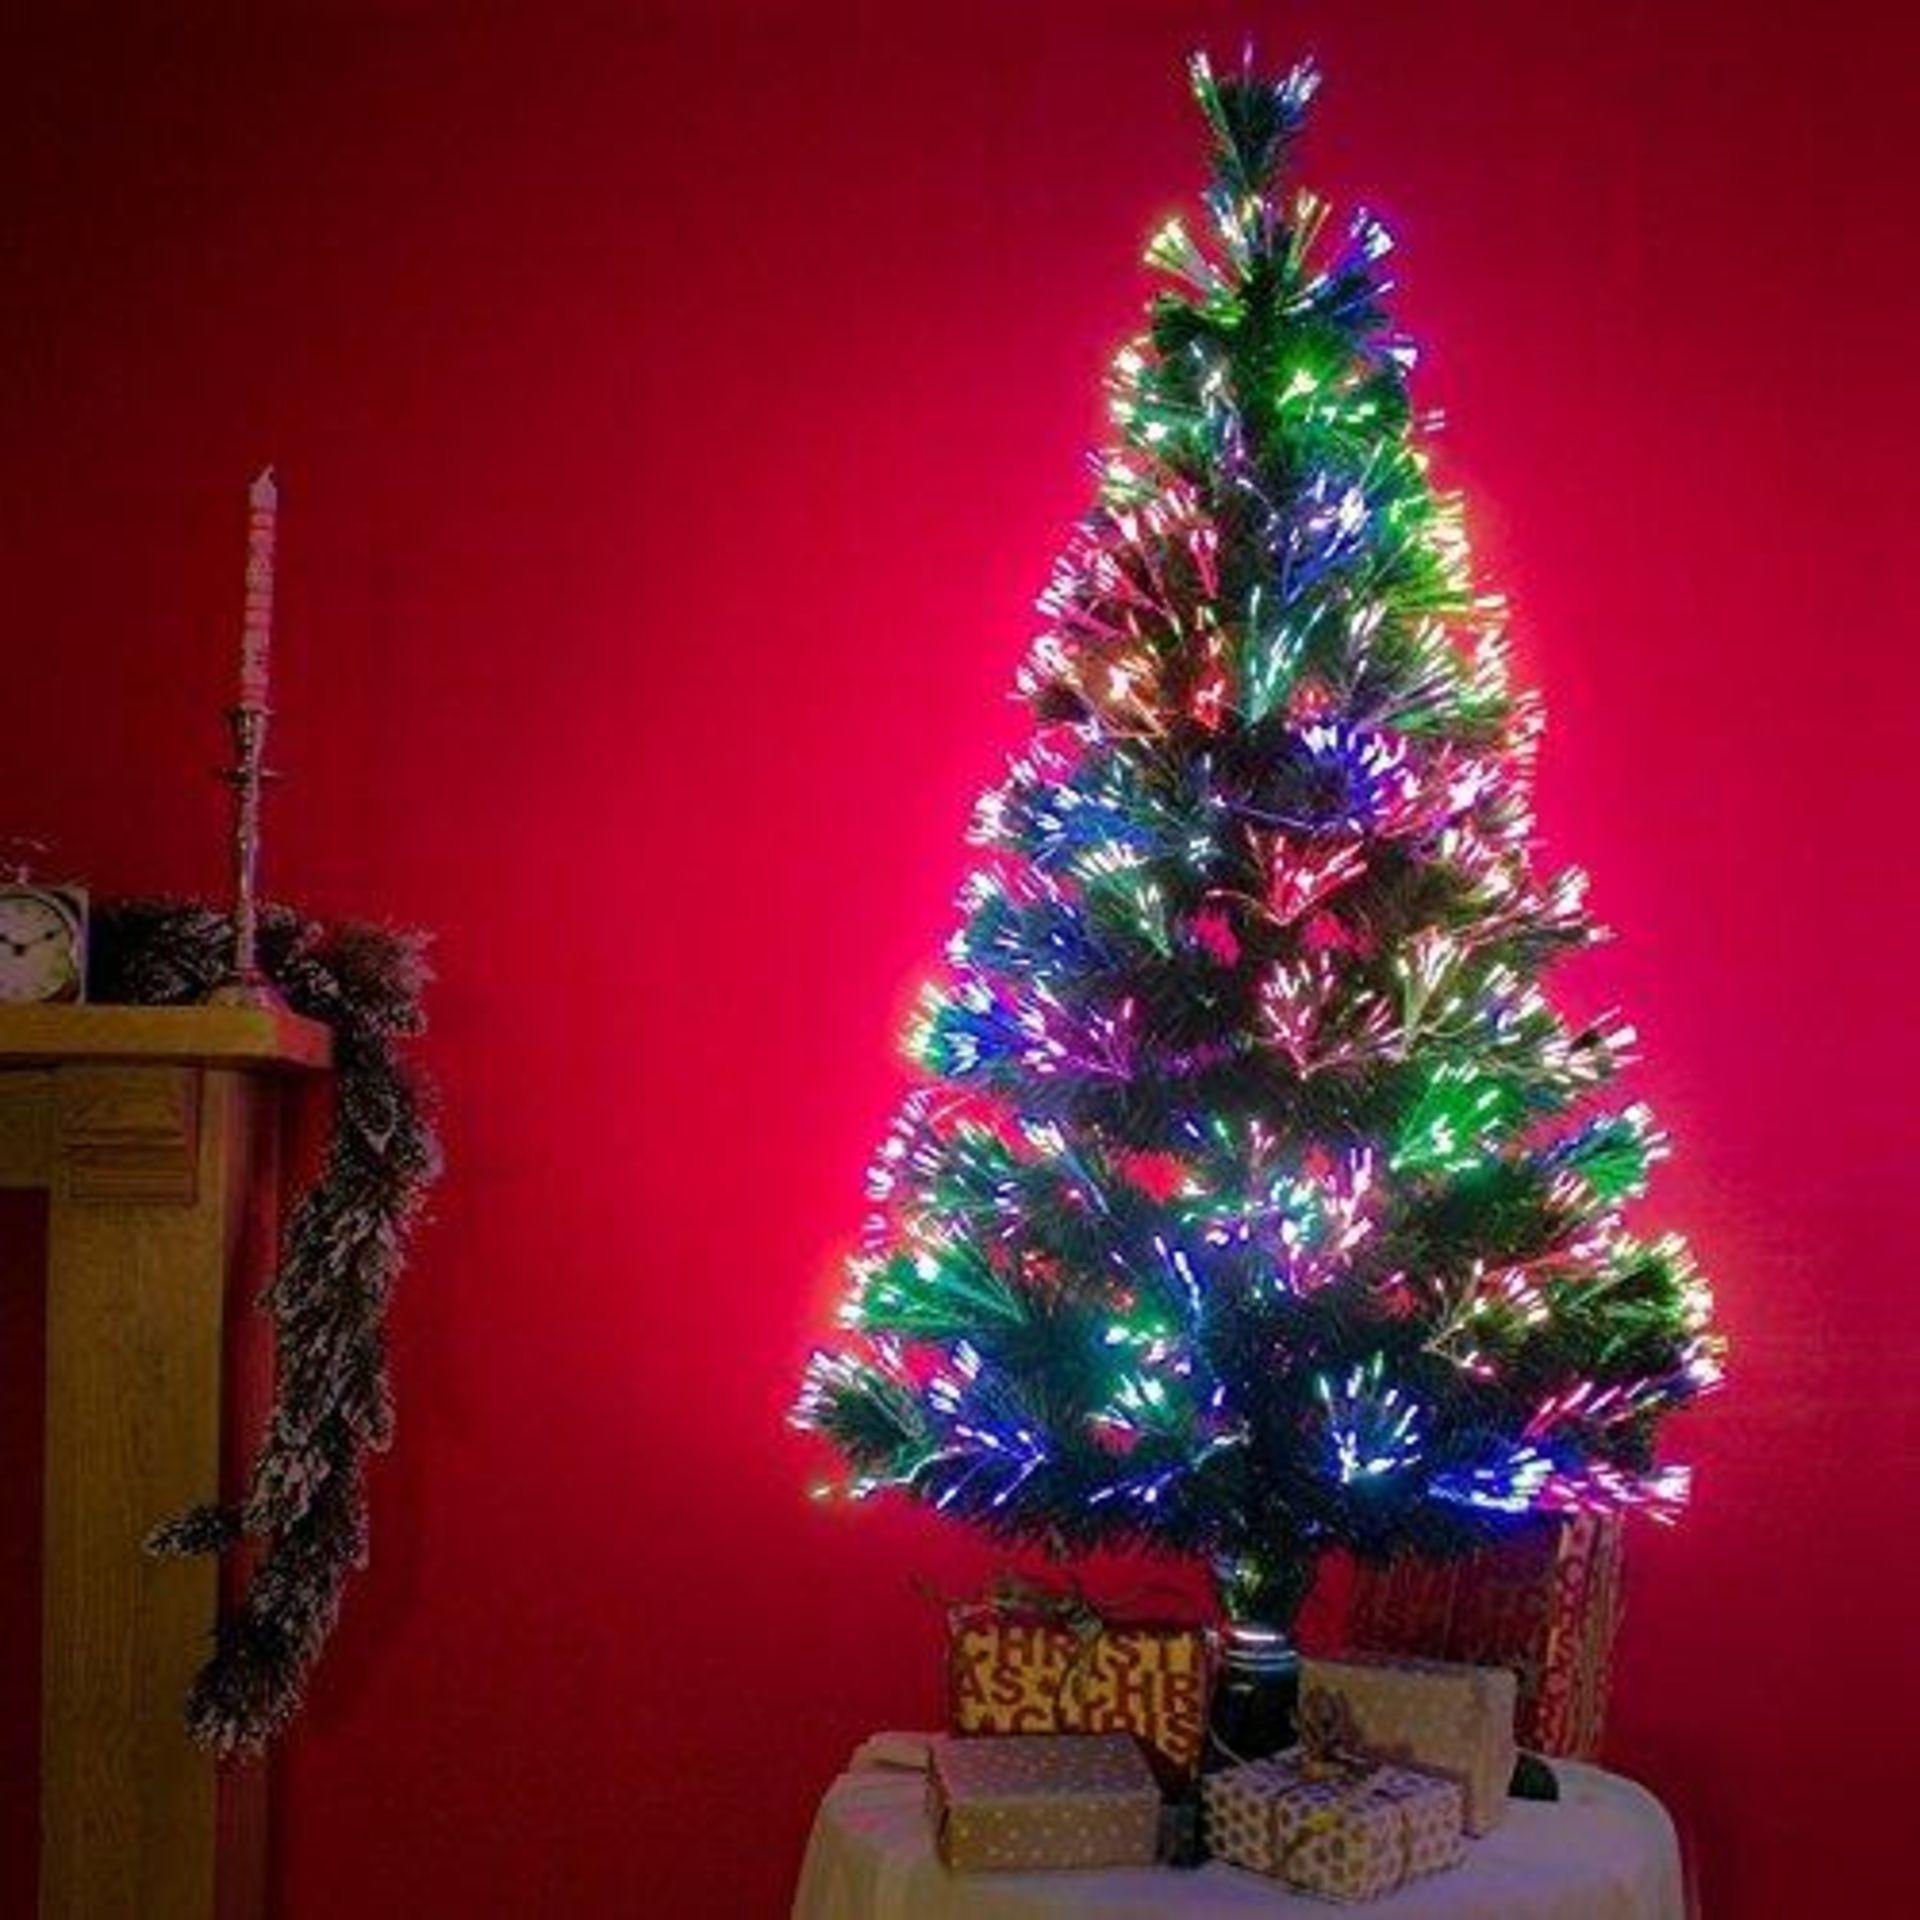 Lot 18001 - V Brand New 90CM Luxury Fibre Optic Christmas Tree With LEDs